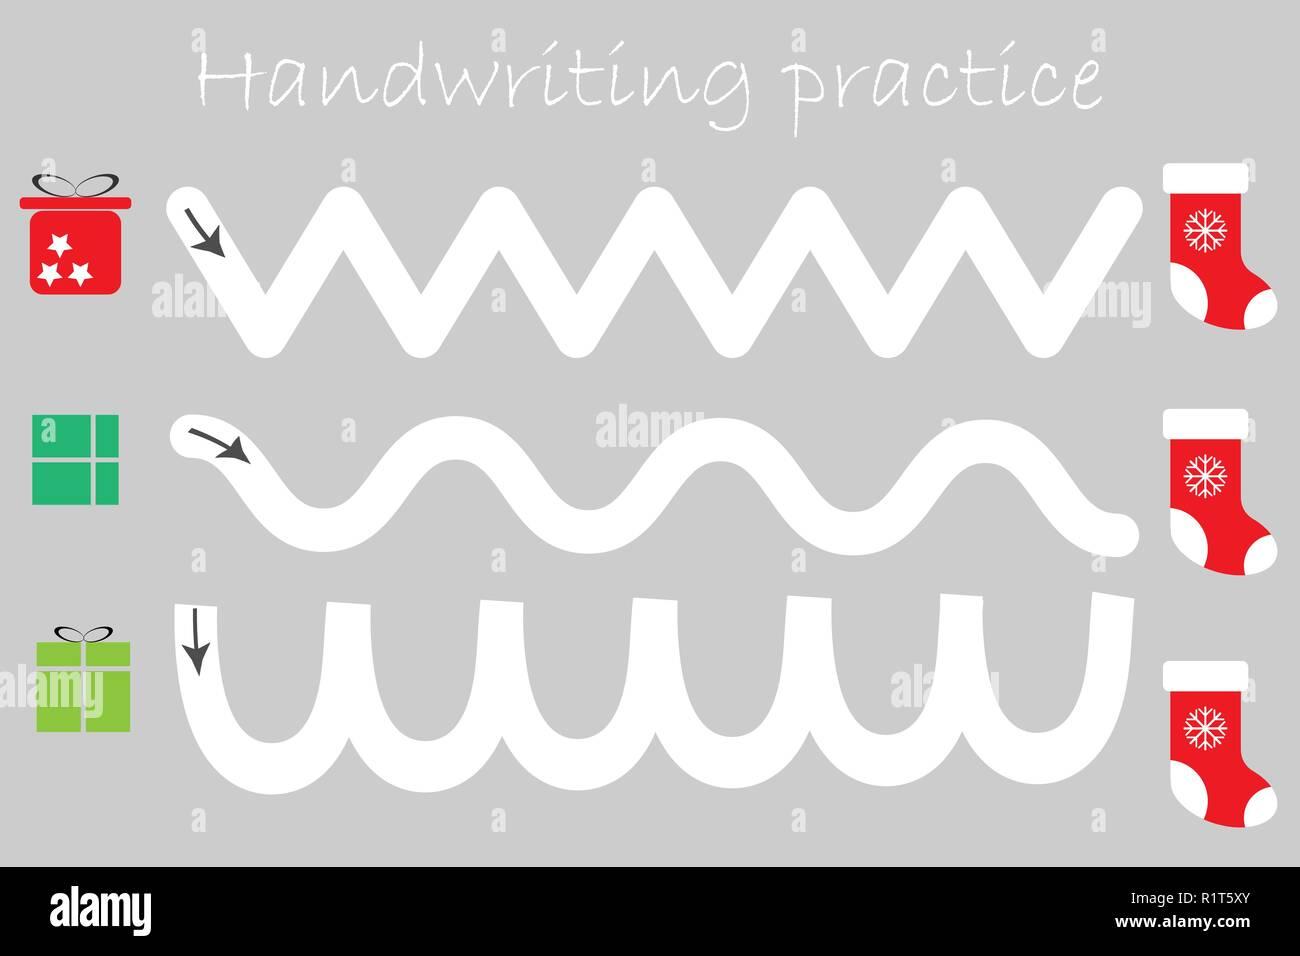 Handwriting Practice Stock Photos Amp Handwriting Practice